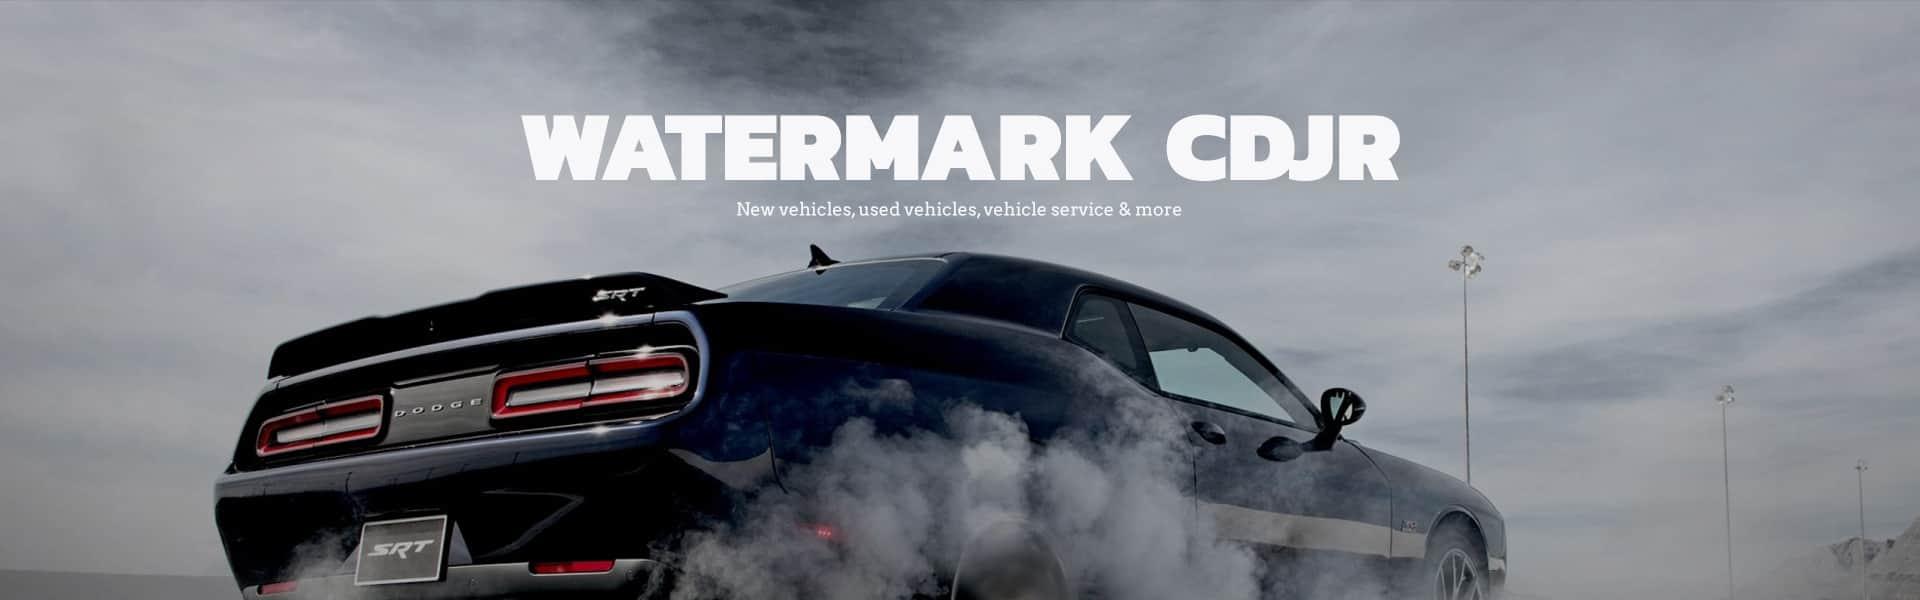 Watermark CDJR